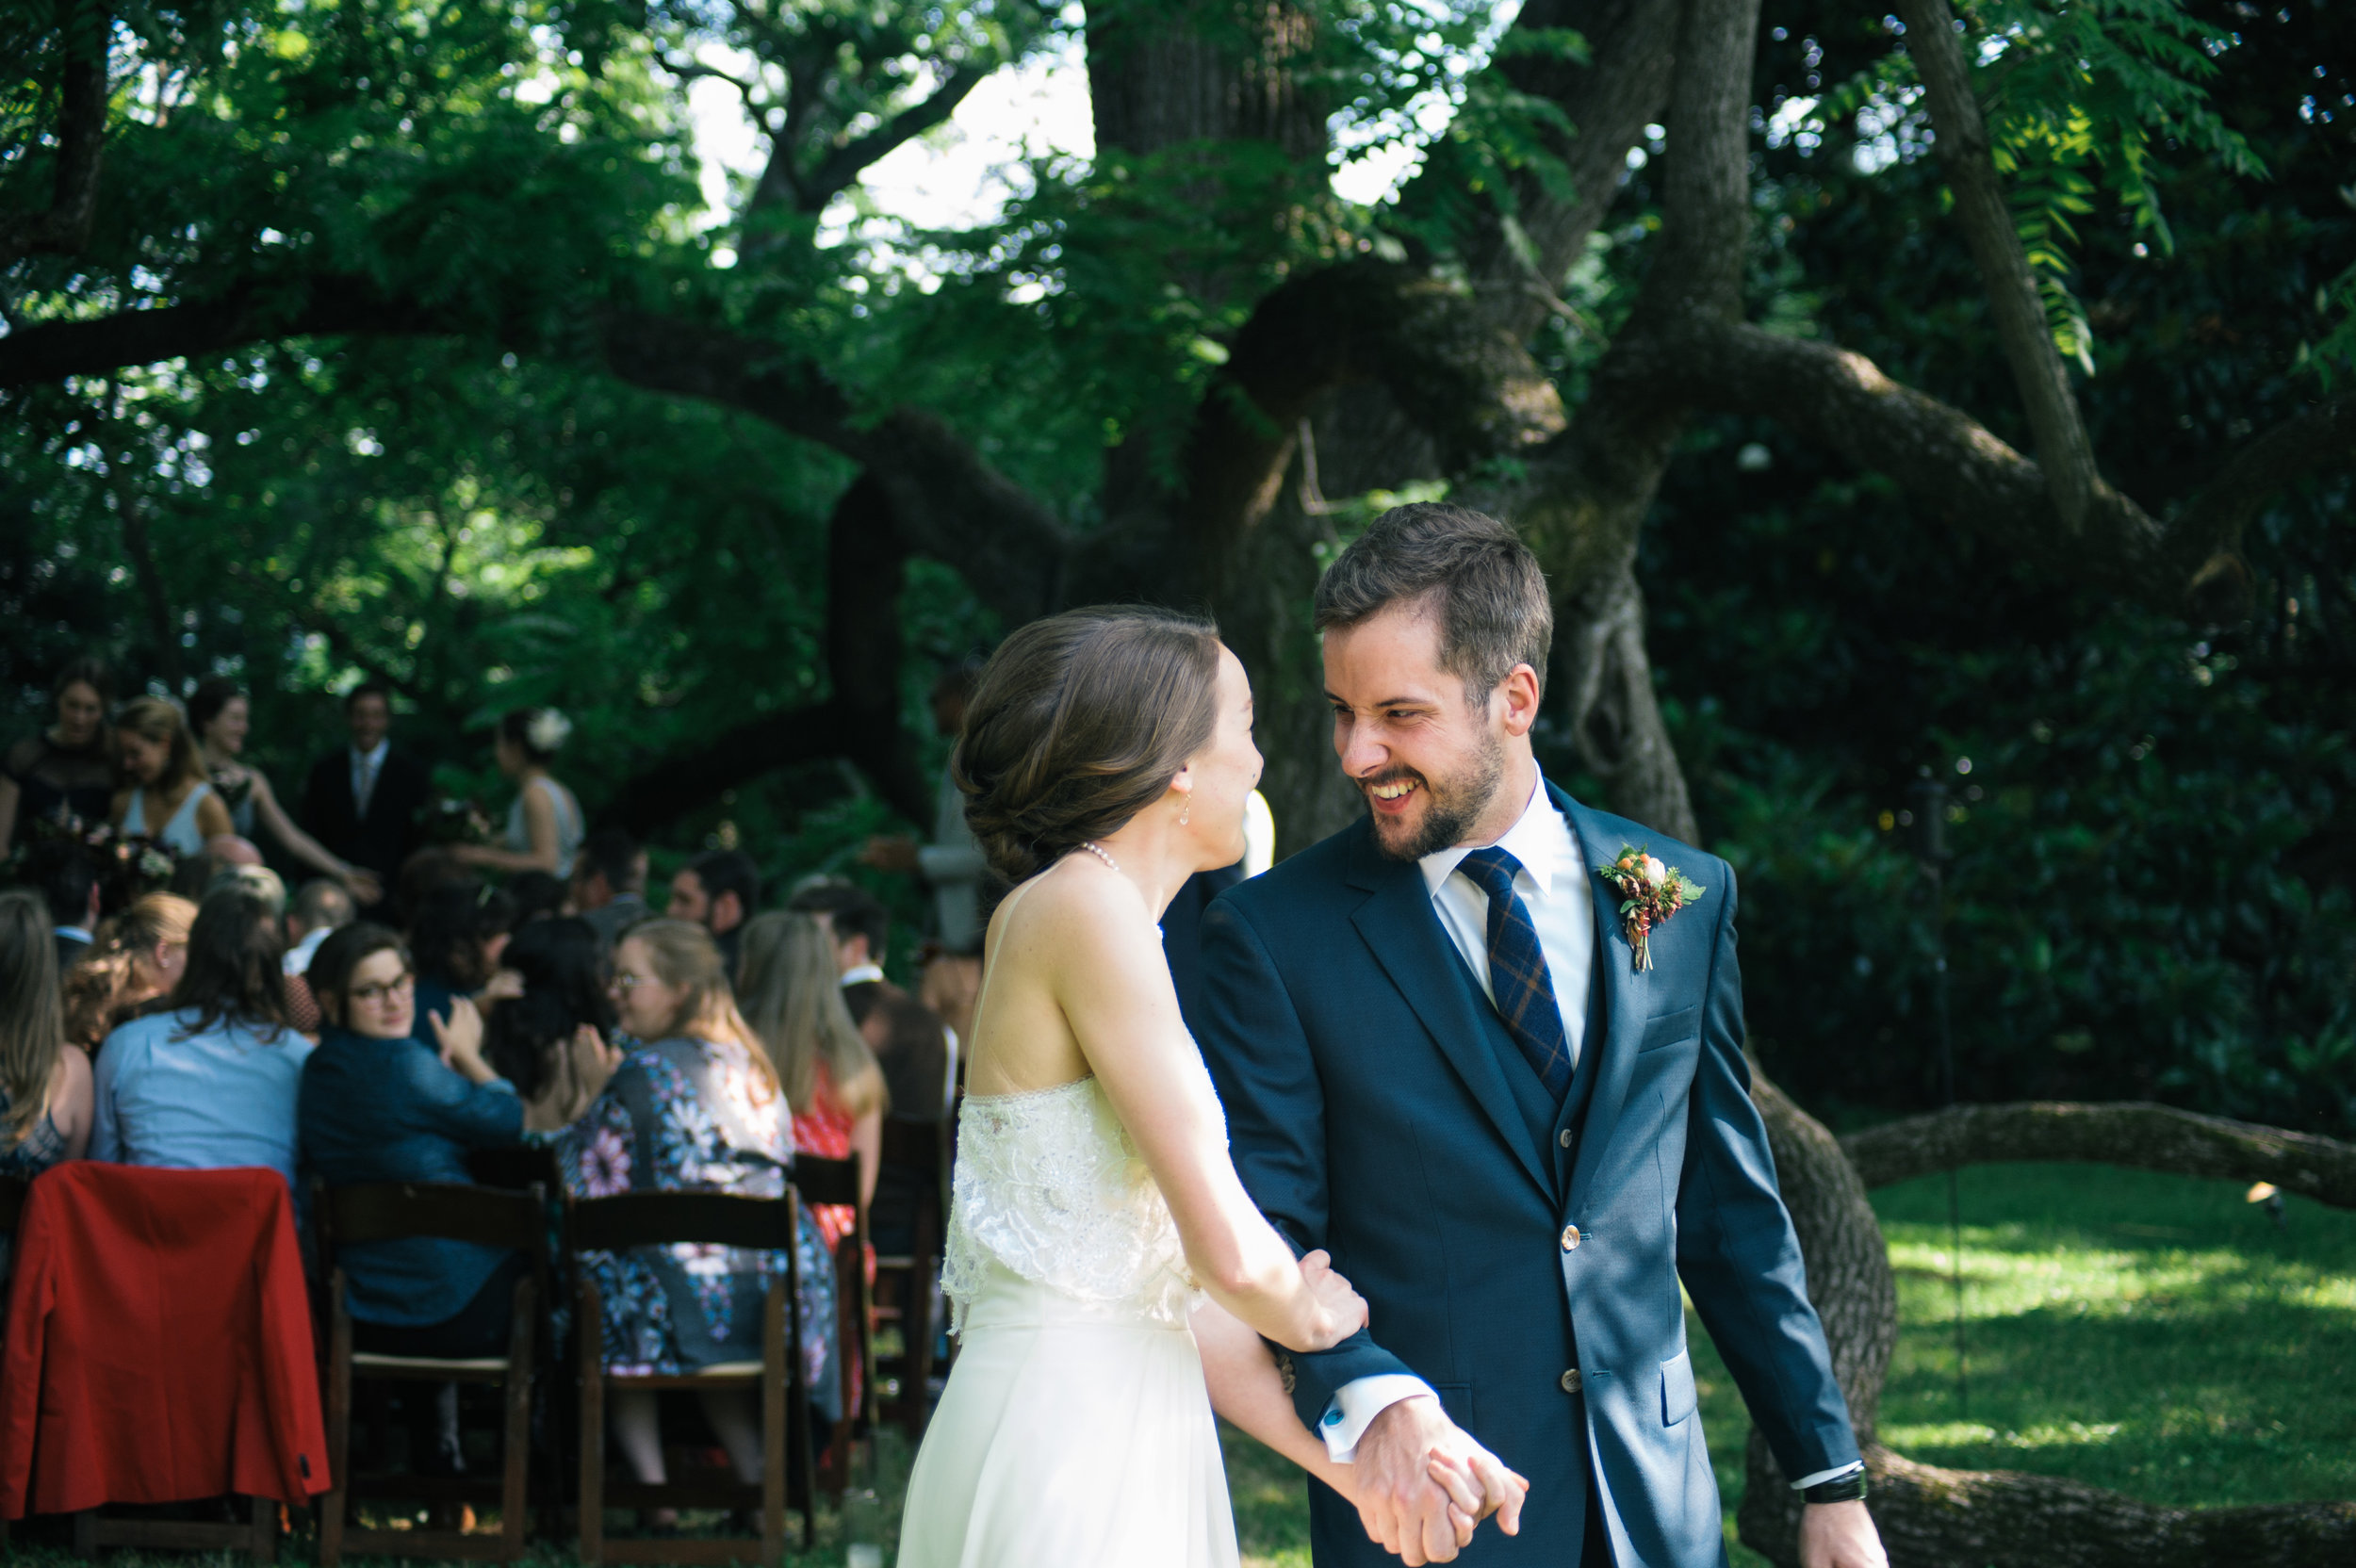 lauren-and-tim-north-carolina-wedding-meg-hill-photo- (1432 of 1087).jpg